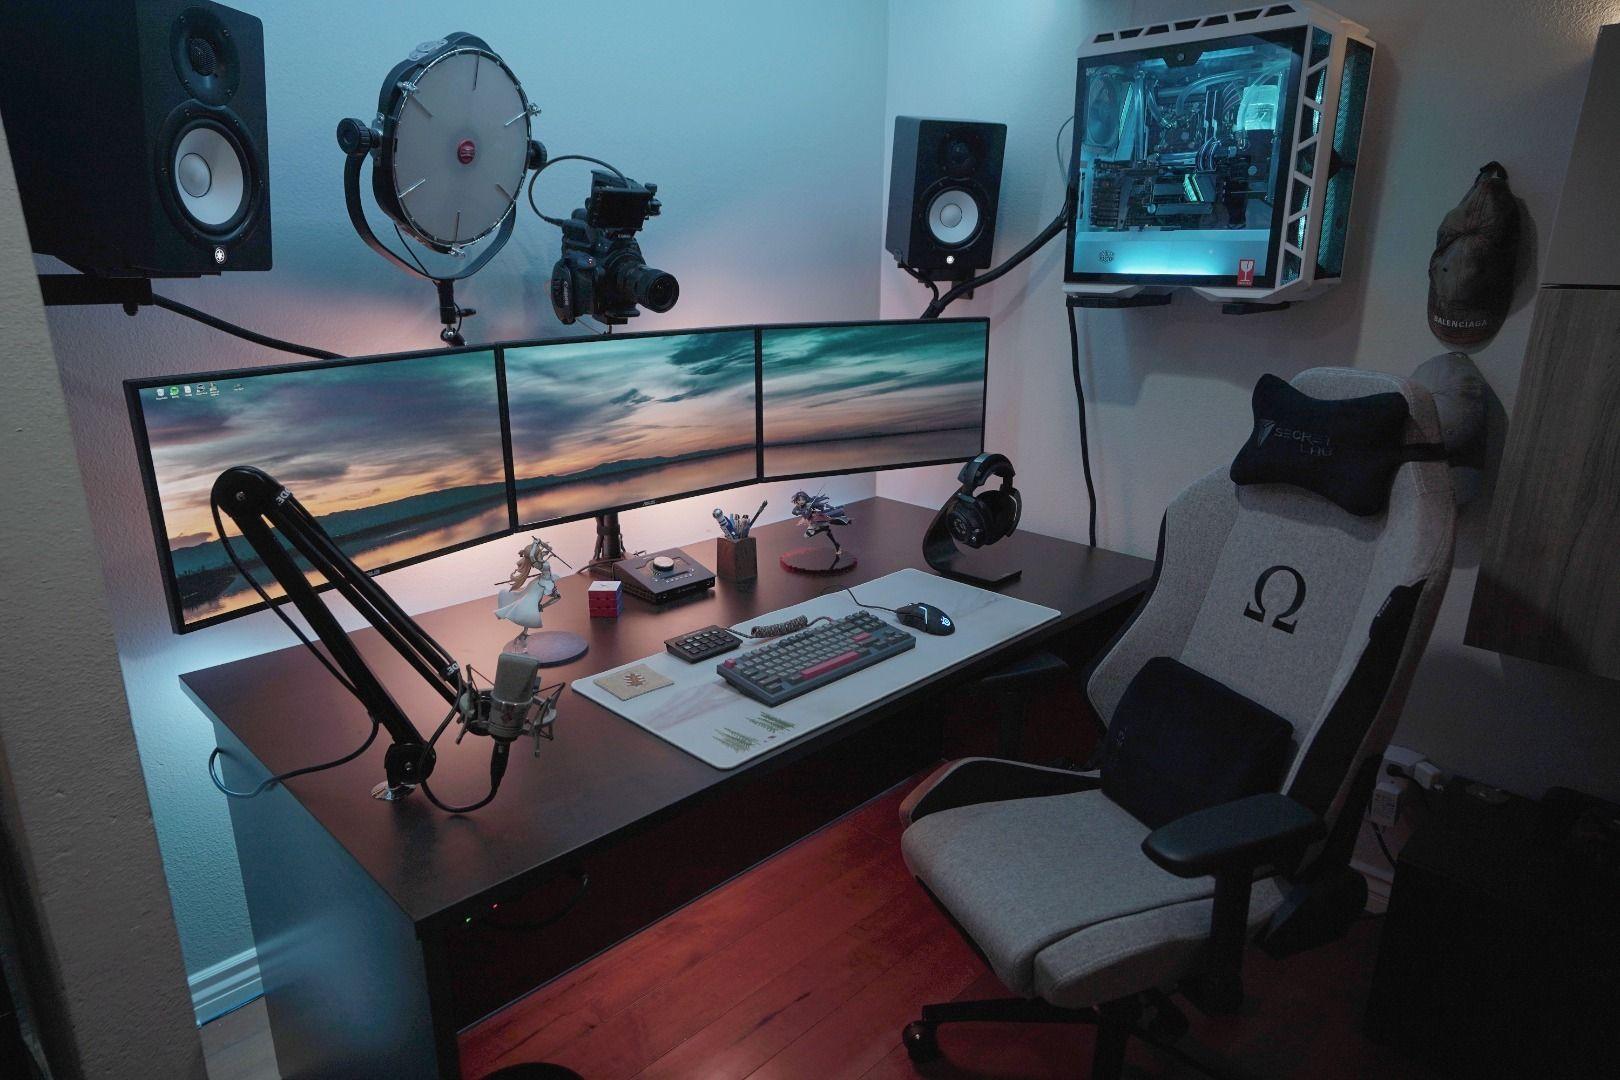 Ultimate Minimal Setup In 2020 Desk Setup Gaming Room Setup Gaming Desk Setup